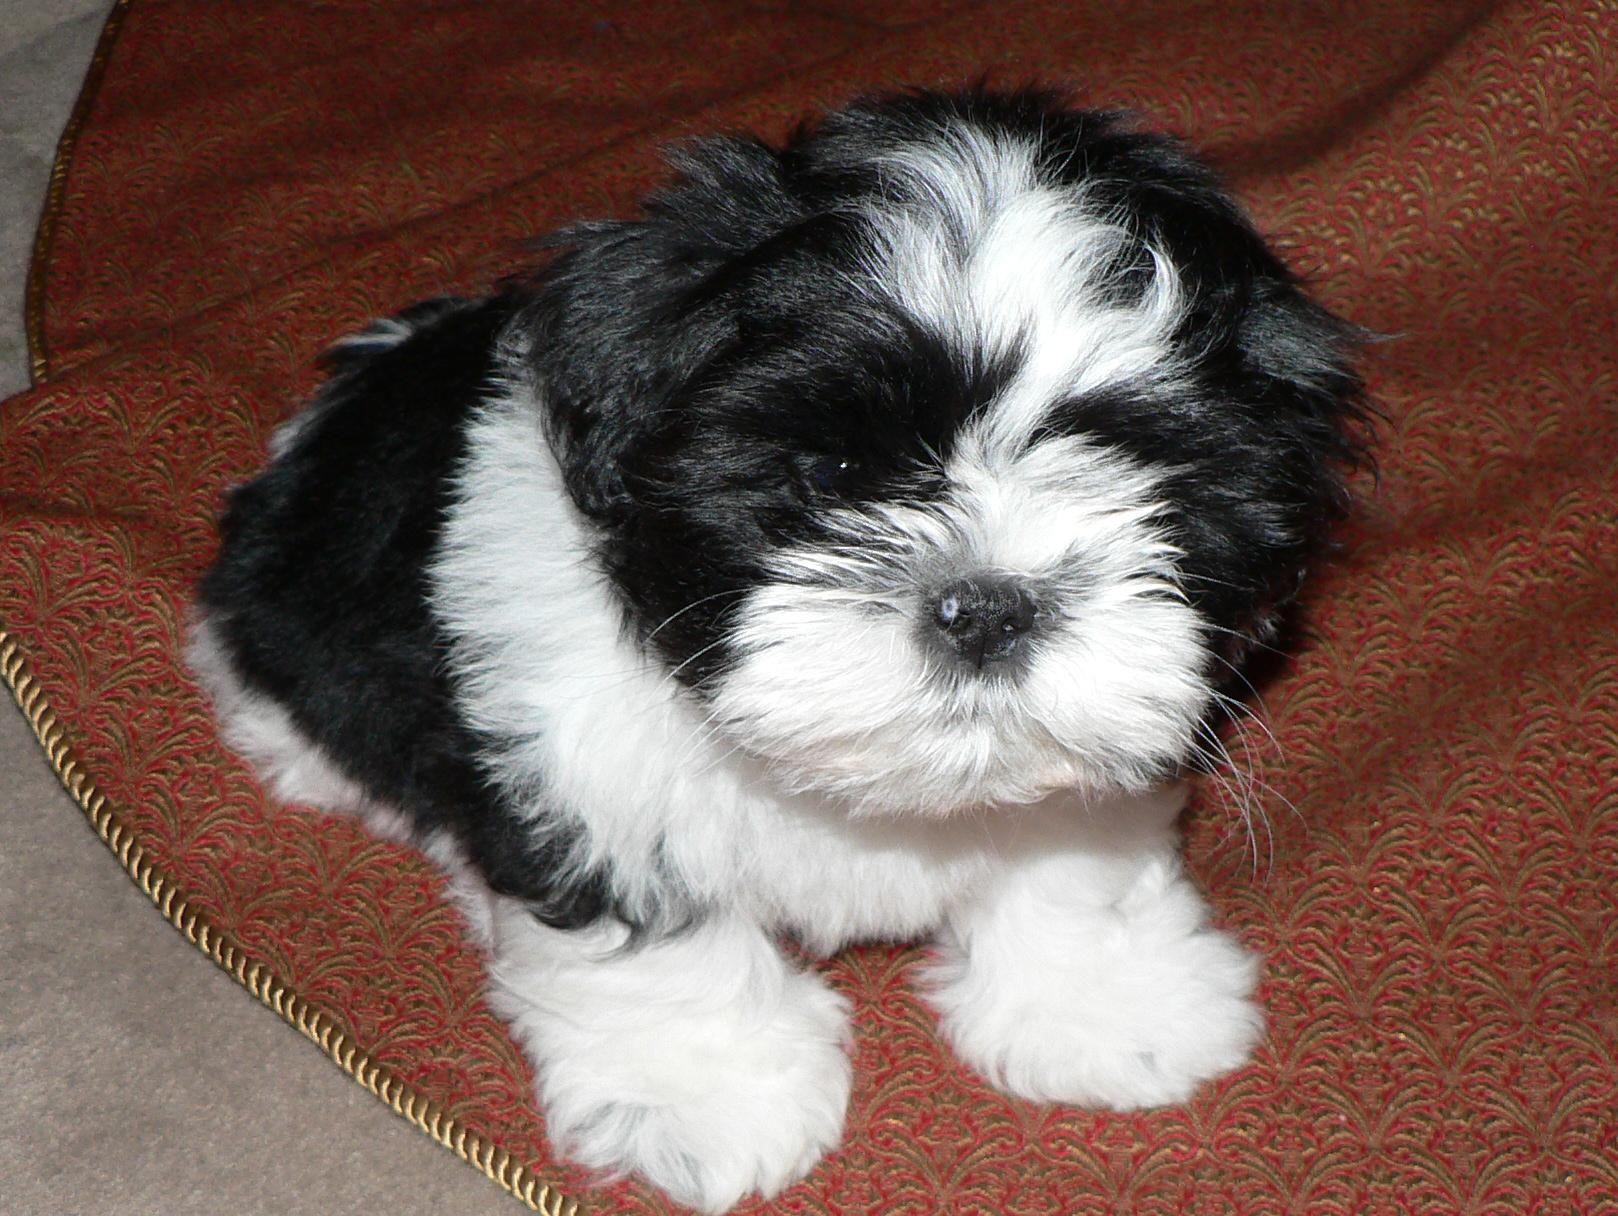 Shih Tzu Information Dog Breeds At Thepetowners Shih Tzu Shih Tzu Puppy Dogs